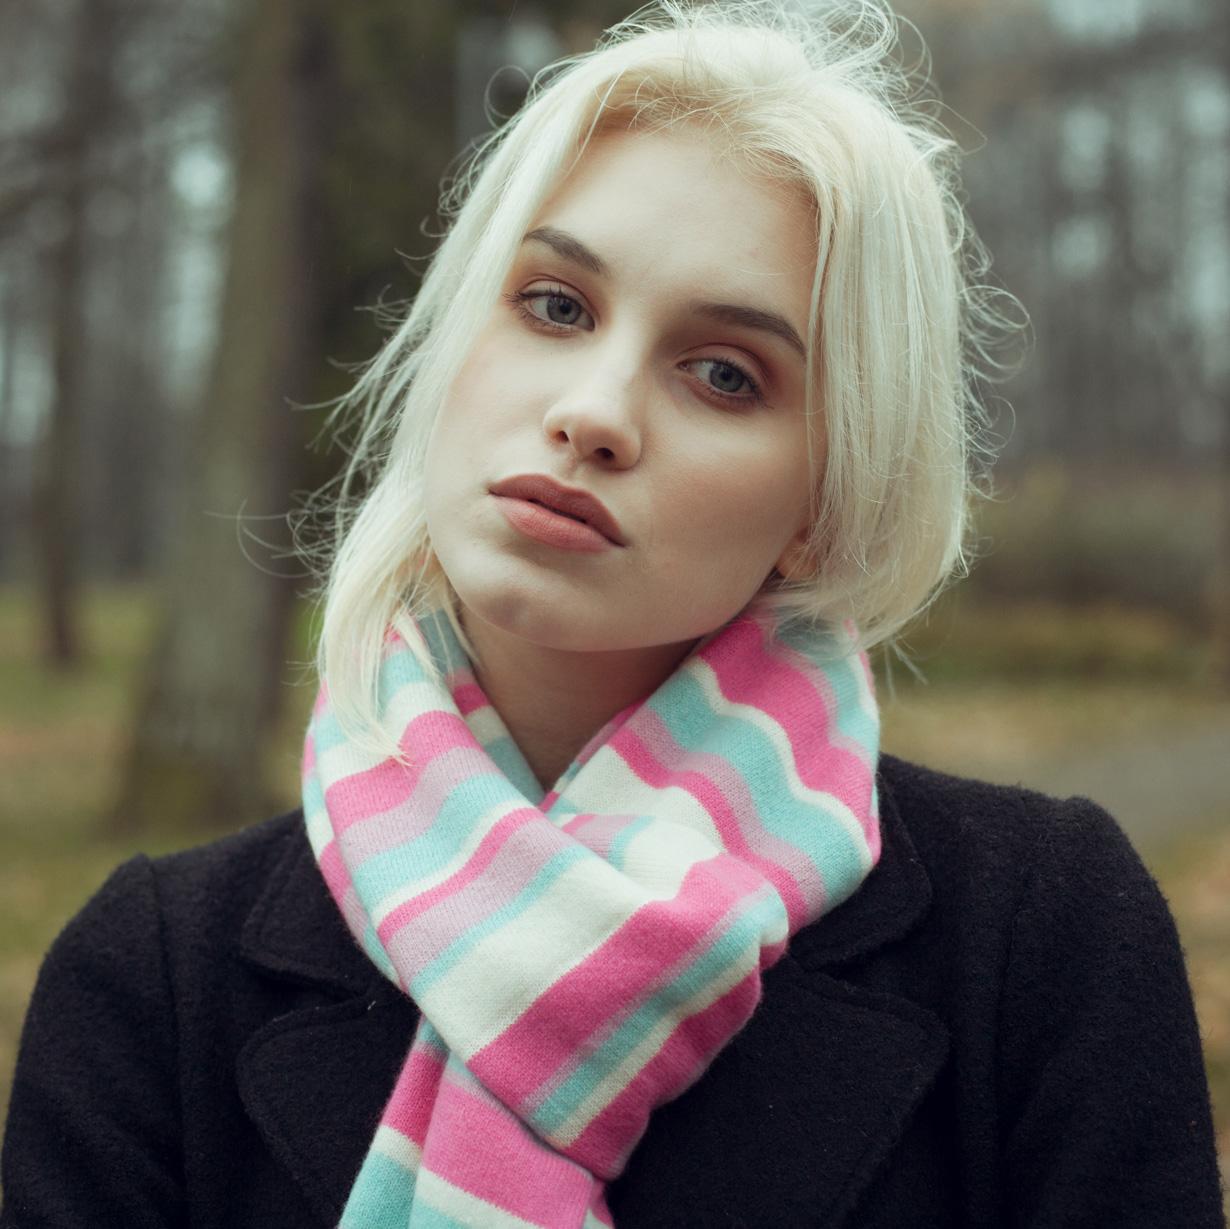 Knitted Stripey Scarf - 170x25cm - 100% Cashmere - Grey Scale